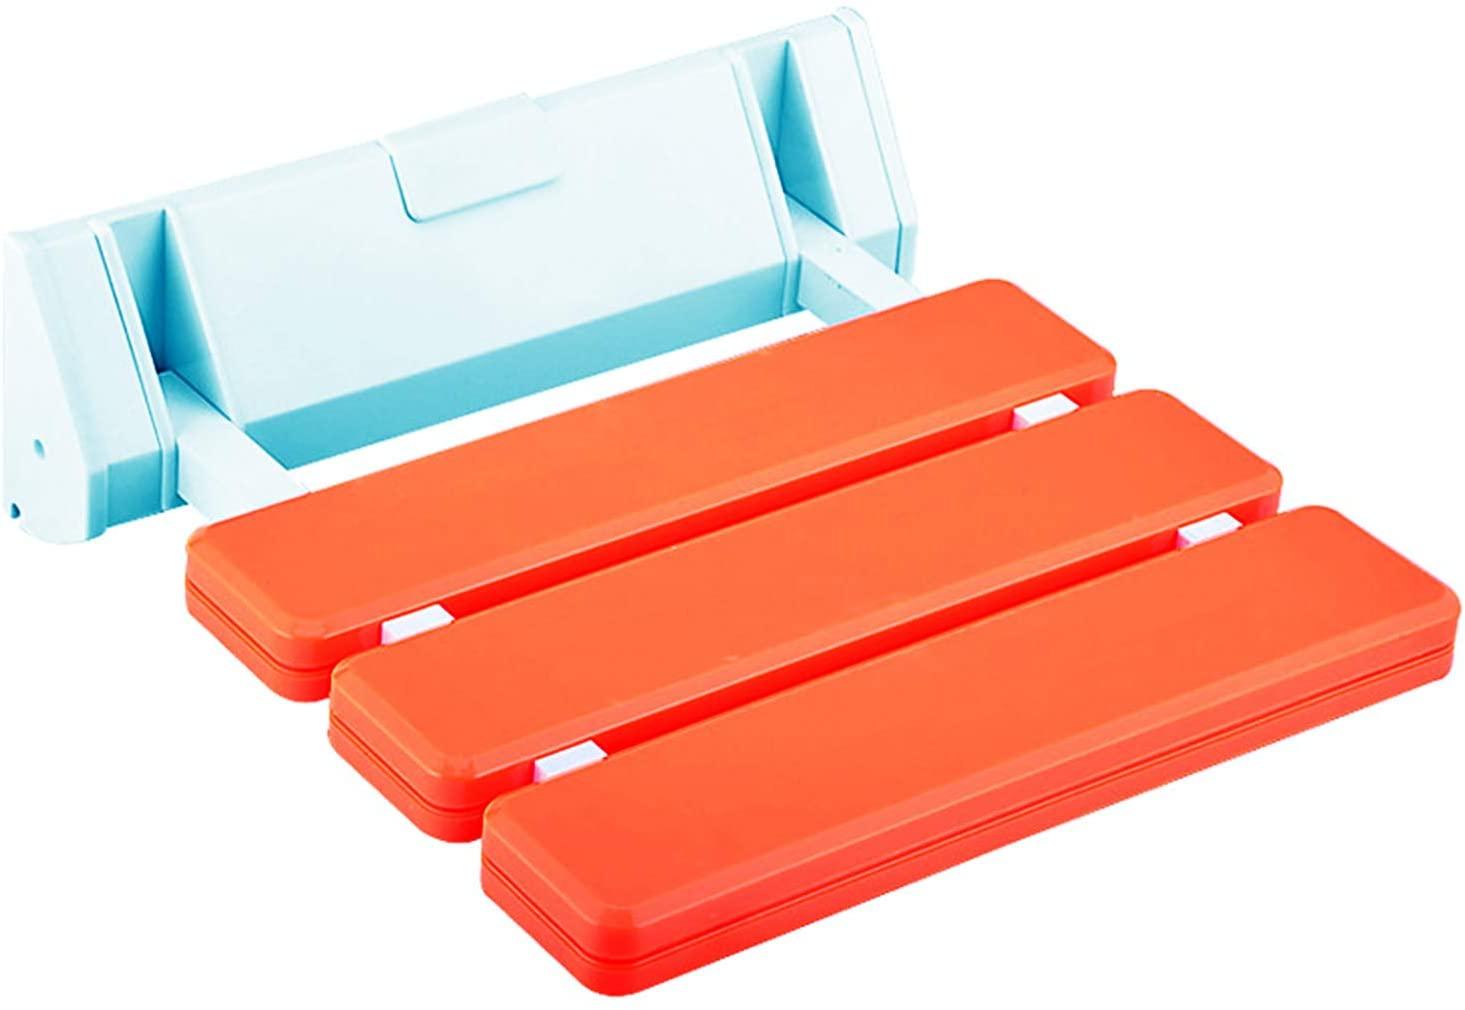 Makidar Folding Shower Seat Bathroom Drop-Leaf Wall Stool (Orange)